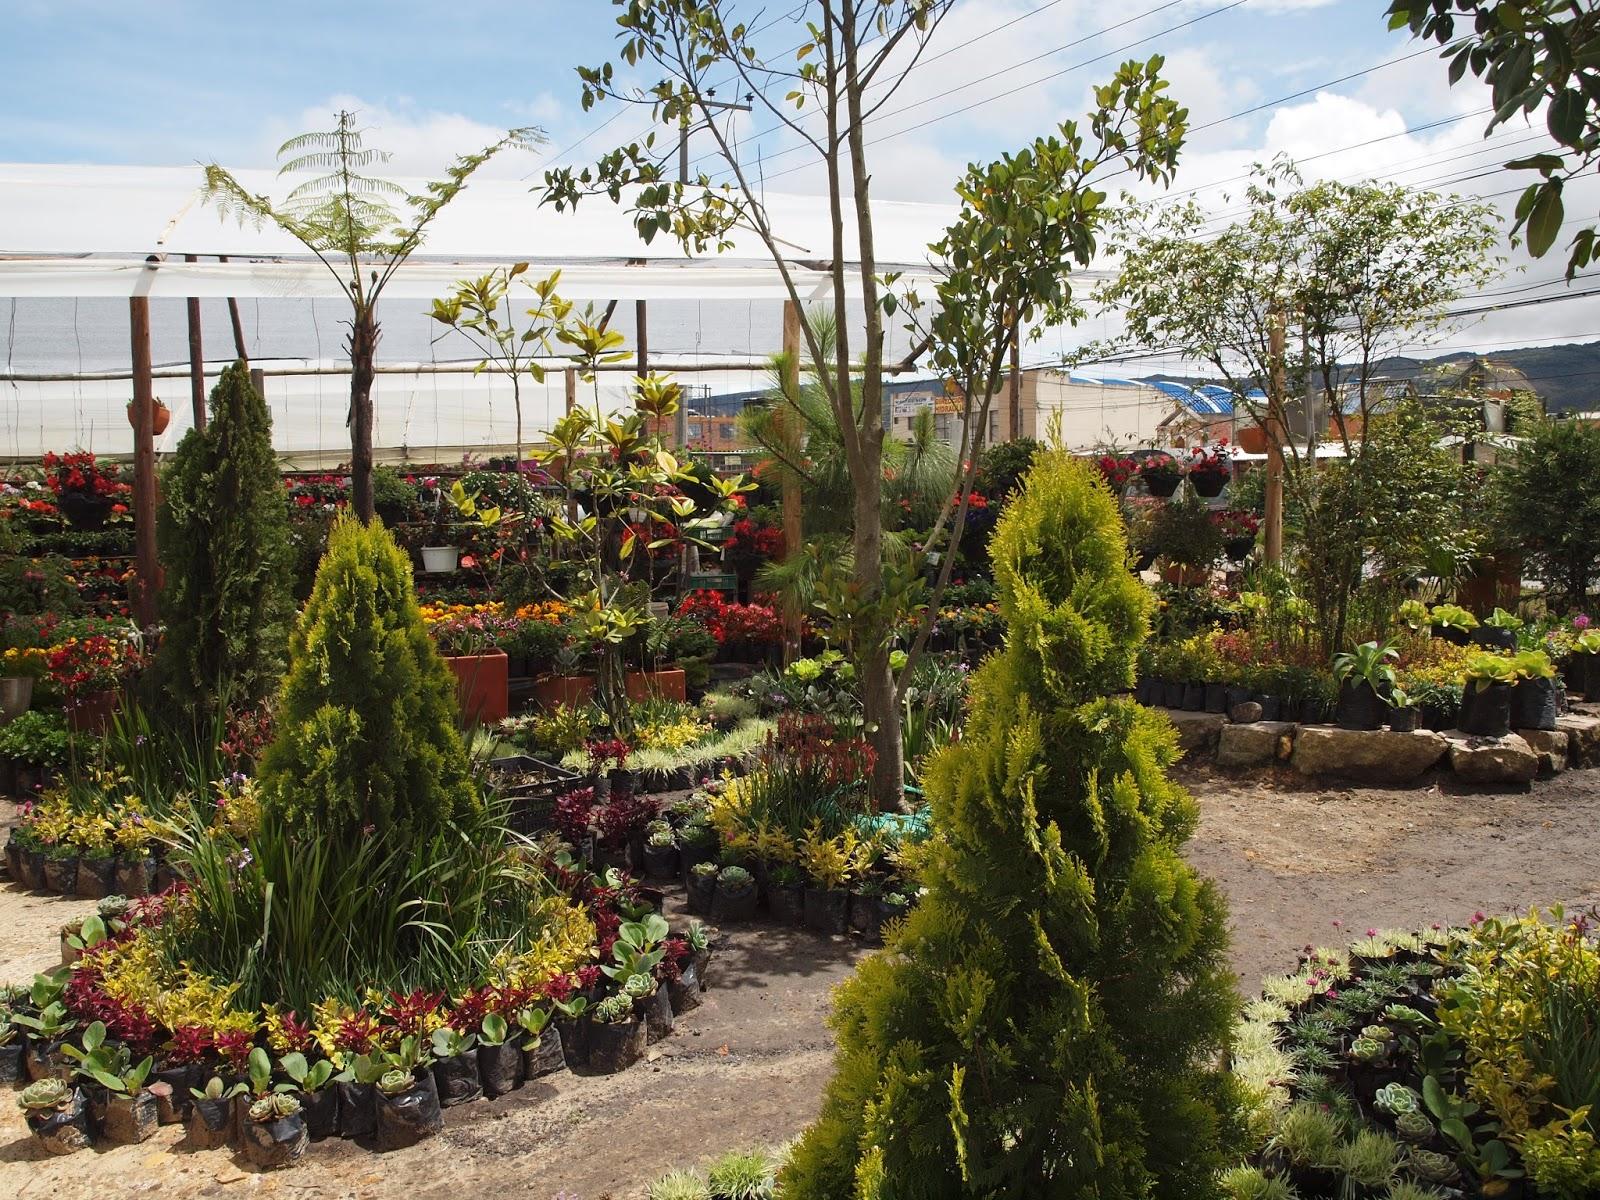 Colombian Theme Park   Adoption